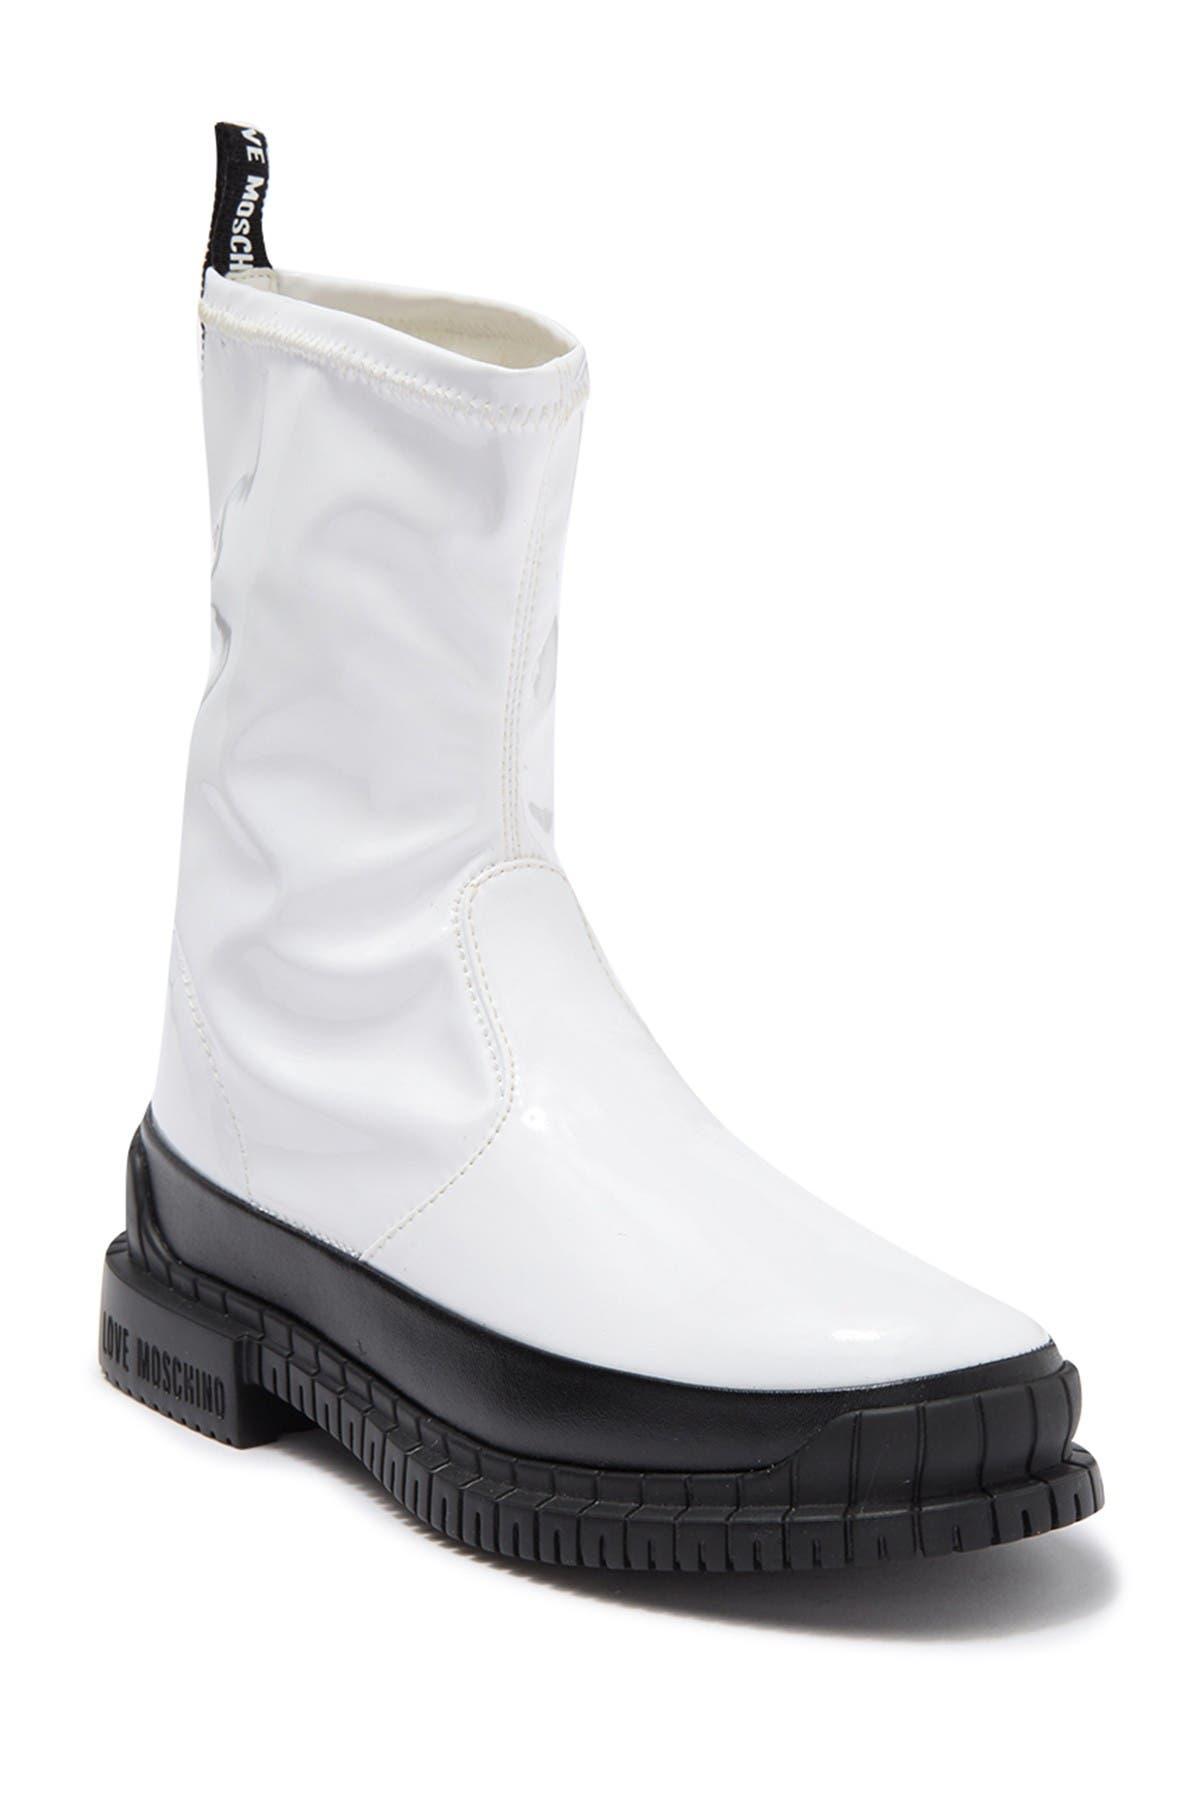 Image of LOVE Moschino Modern Patent Boot